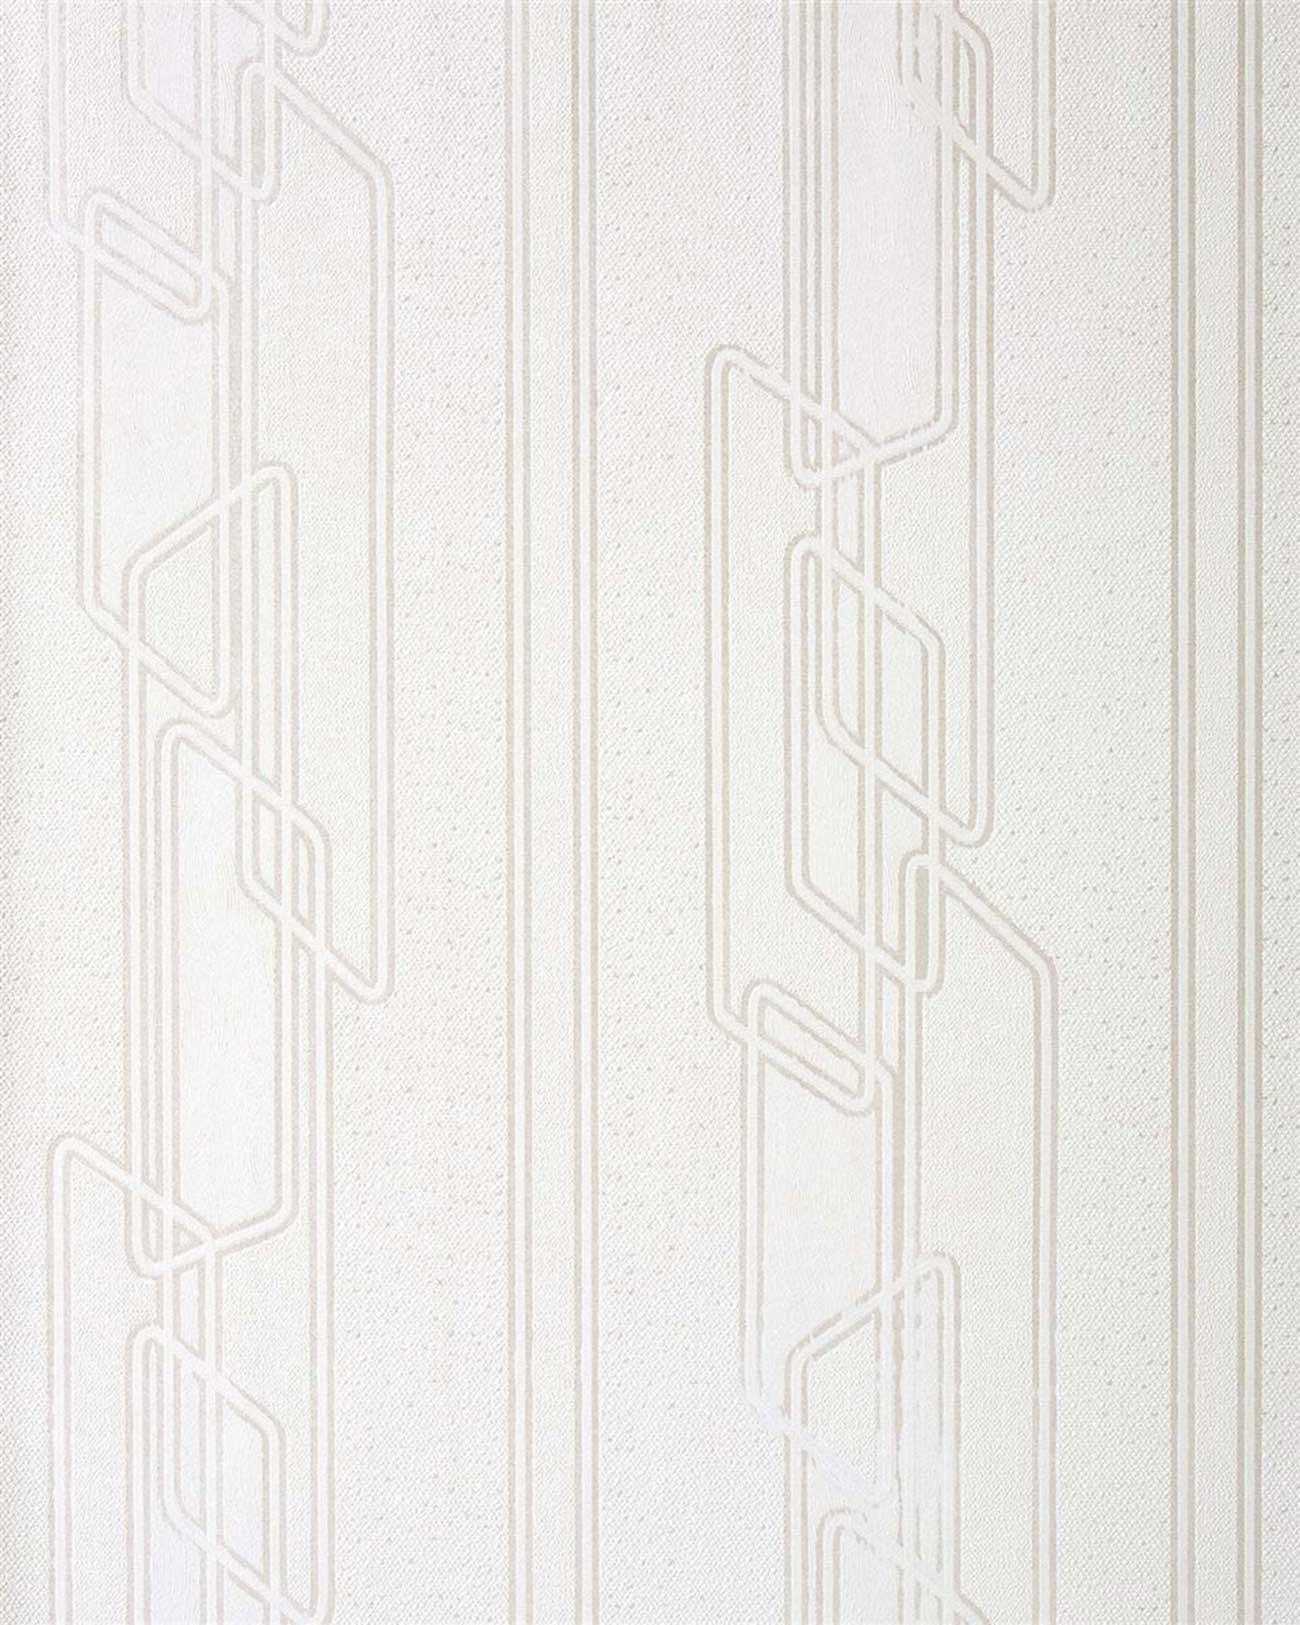 Vinyl Tapeten Hersteller : Silver Wall Coverings Pattern